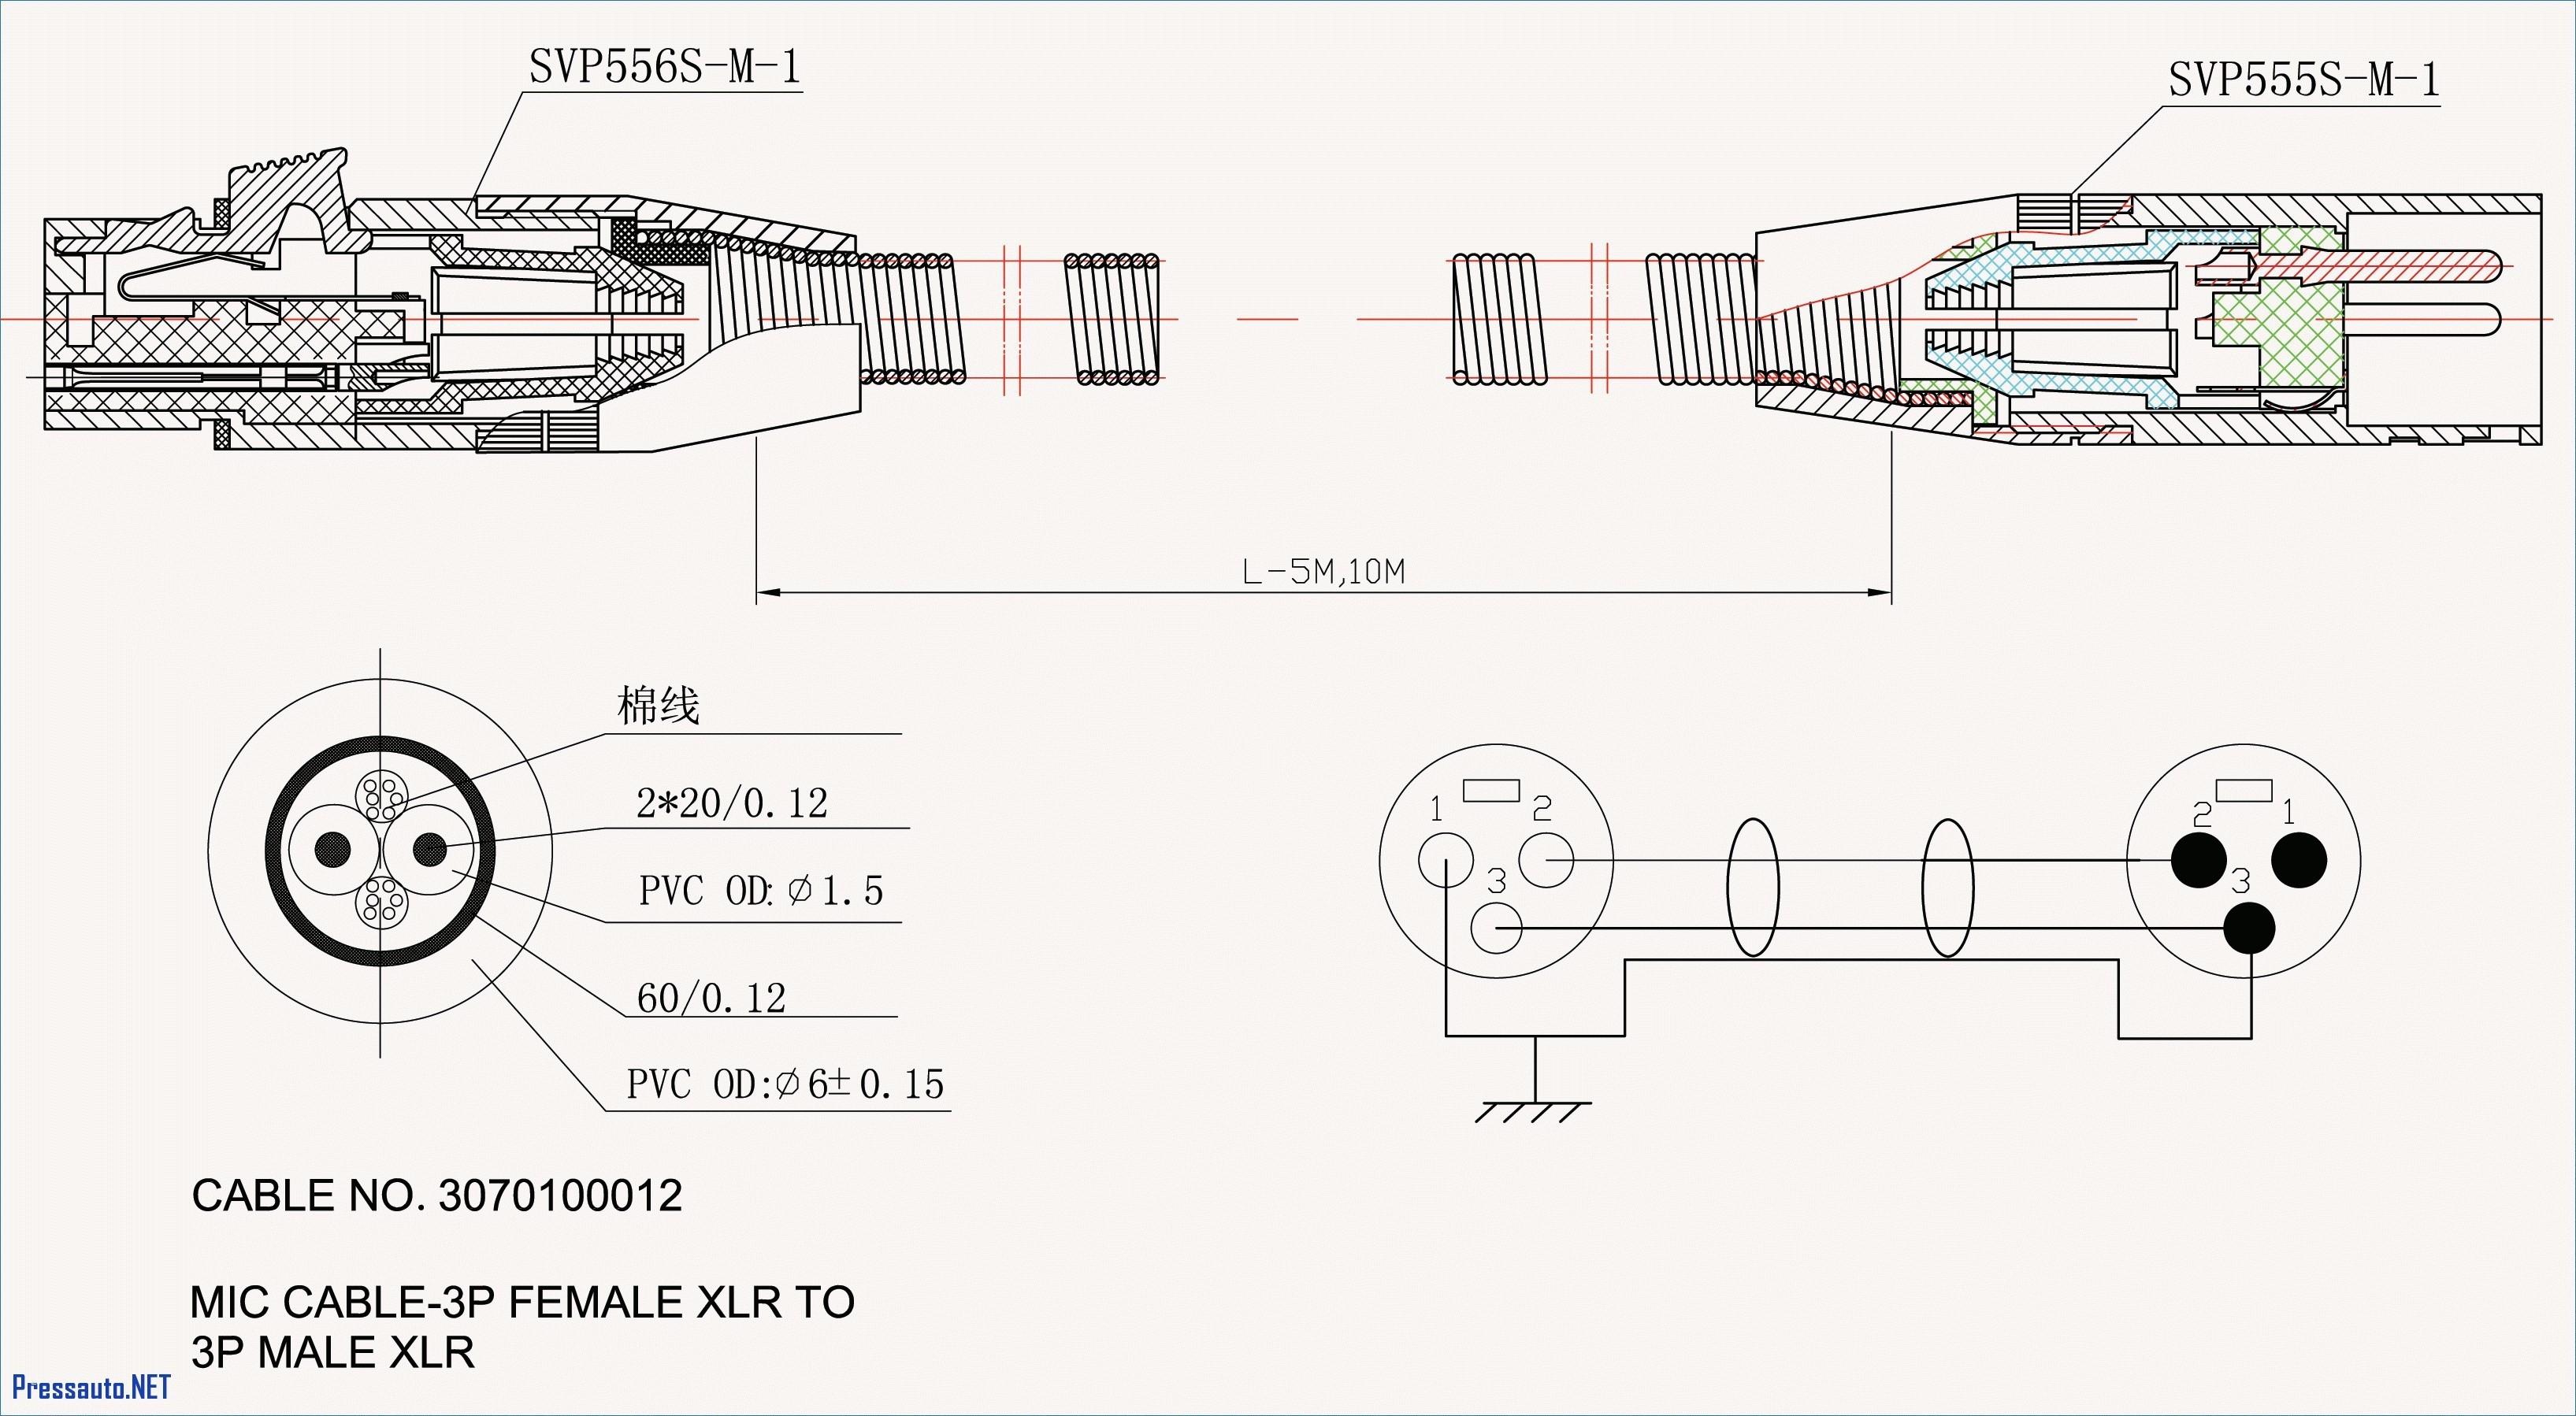 Nissan Titan Trailer Wiring Diagram 2004 Polaris Ranger Parts Diagram – Jeido Of Nissan Titan Trailer Wiring Diagram